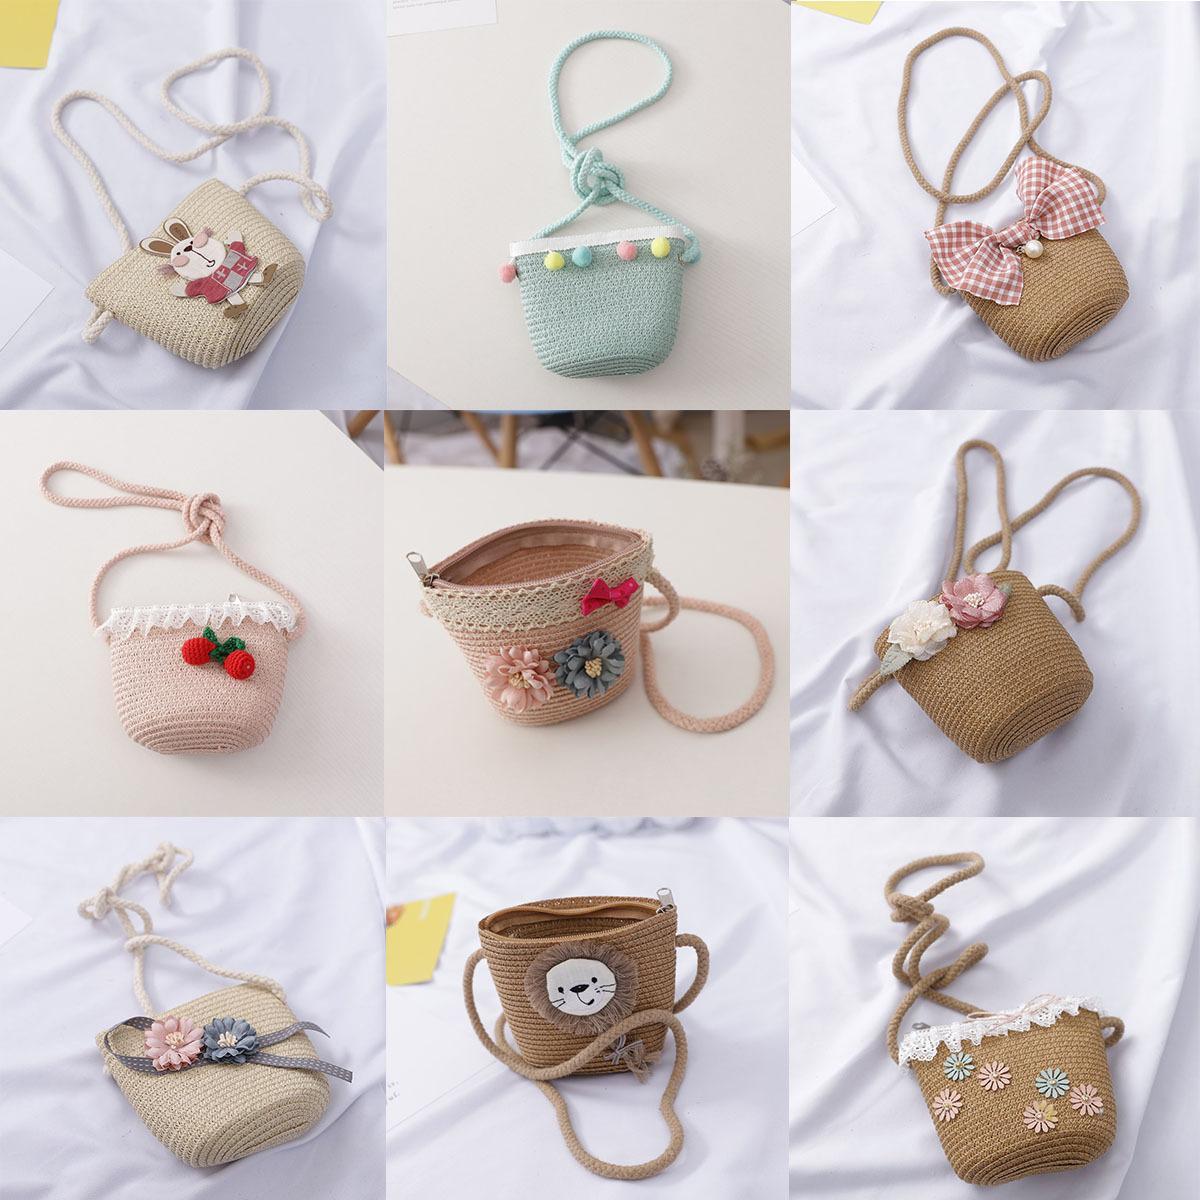 48 Styles Kid Girls Straw Bag Summer Boho Handbags For Girls Messenger Bag Flower Crossbody Travel Beach bags baby Pouch Purse M1786